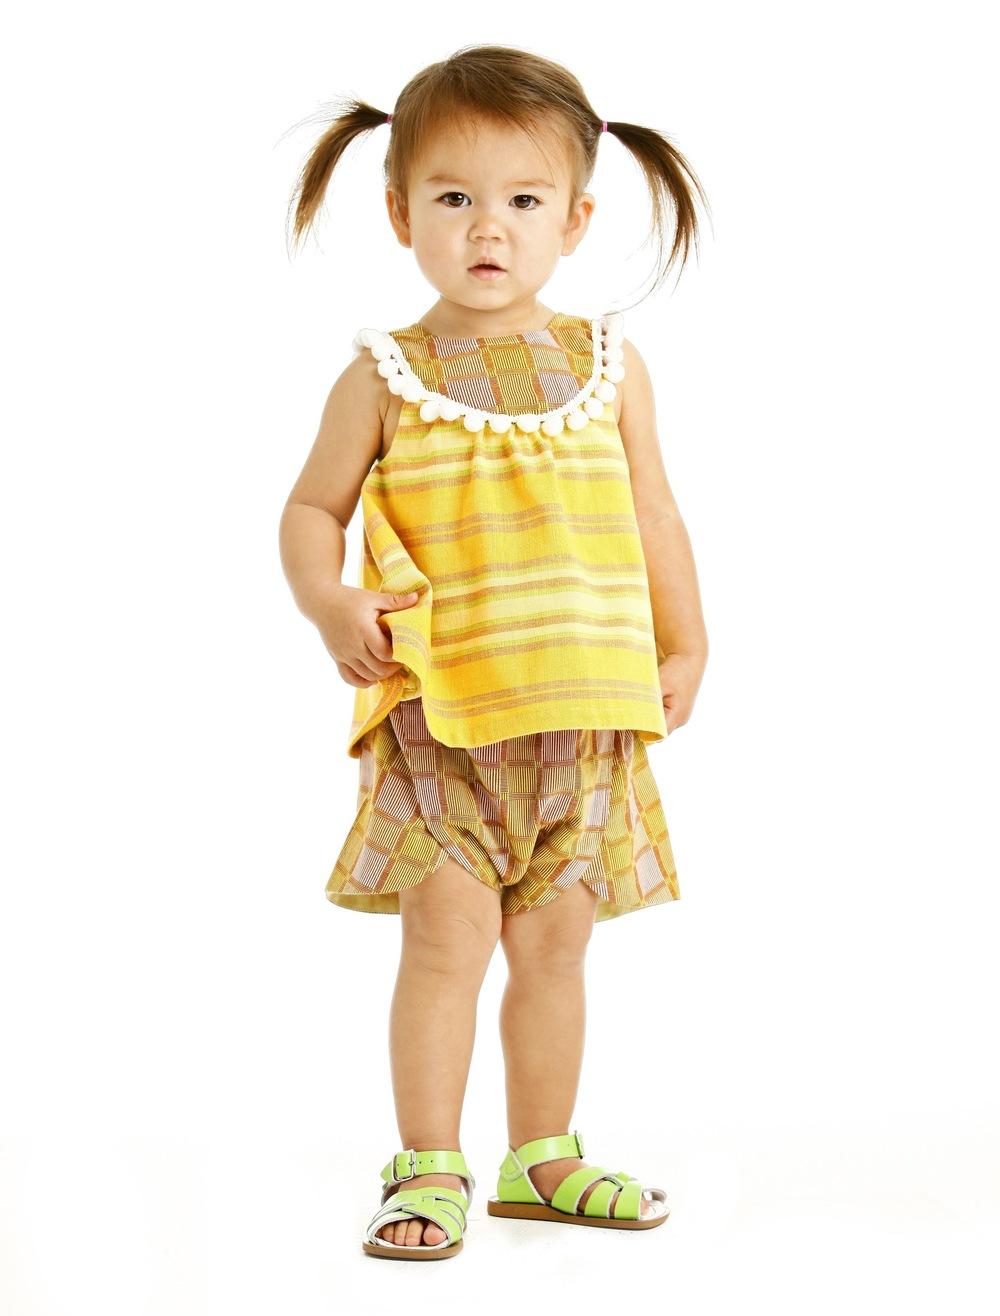 Amelia in the pompom bib tank and foldover shorts